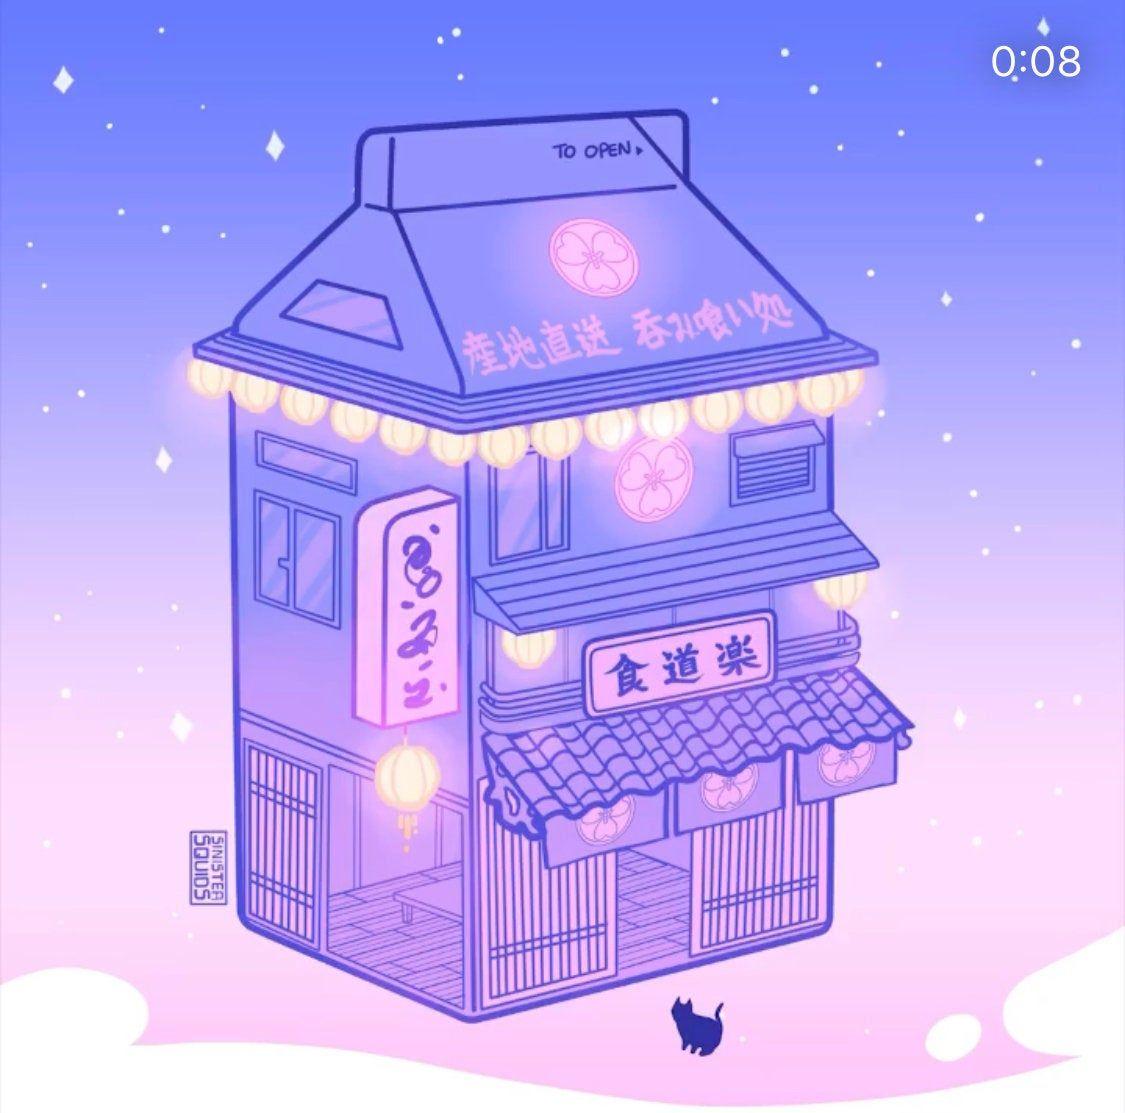 Animated Midnight Juice Box Cafe Mp4 Phone Wallpaper Or Background Vaporwave Aesthetic Digital Download B Animal Crossing Music Vaporwave Animation Artwork